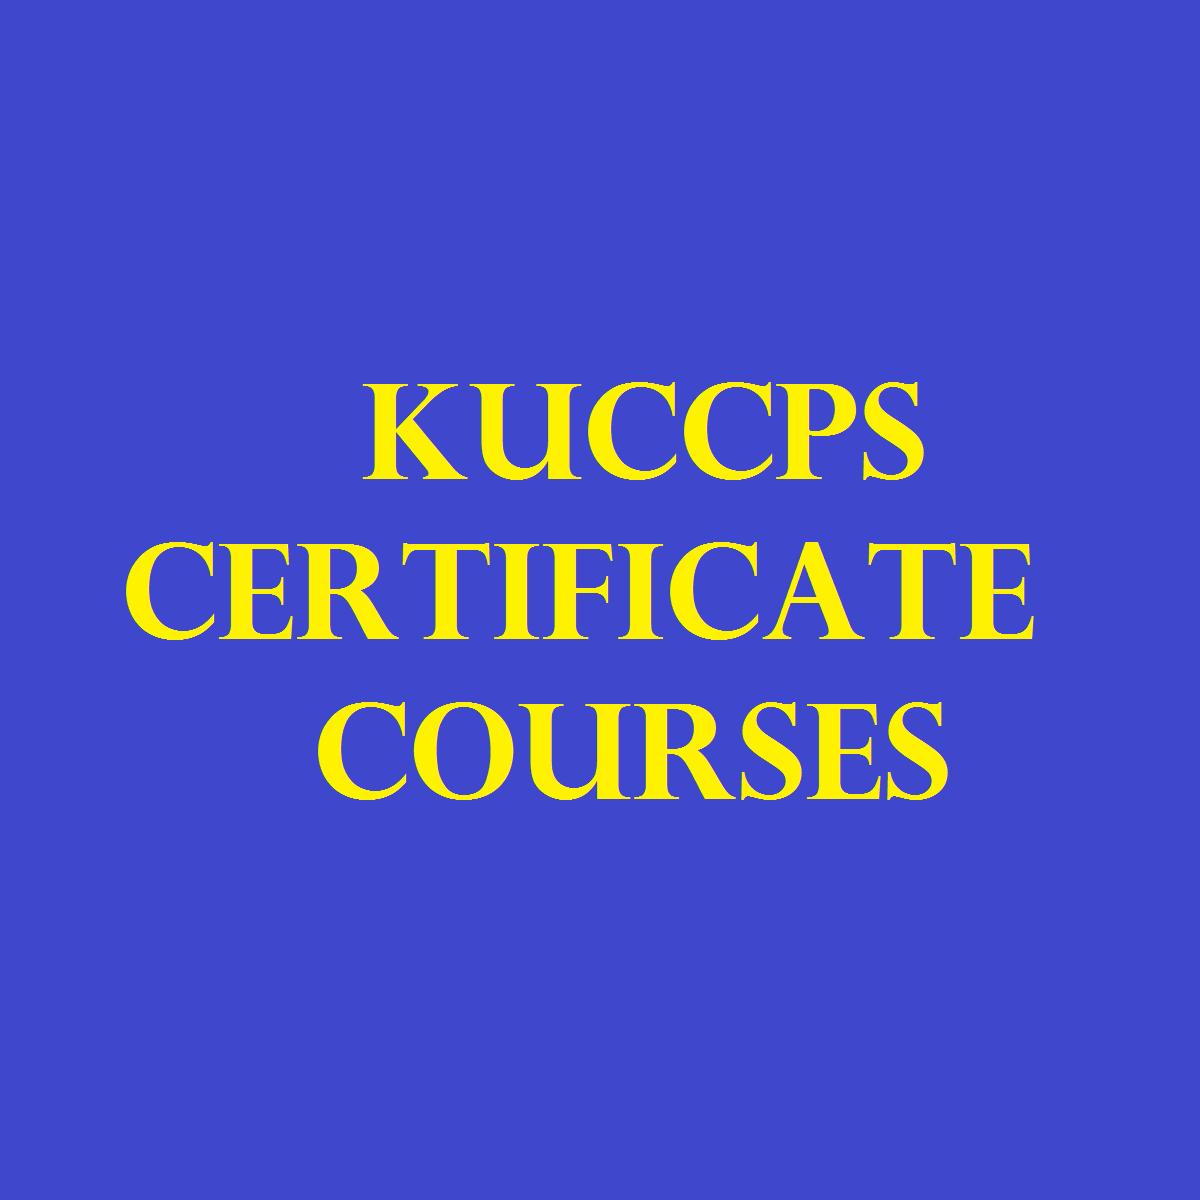 KUCCPS certificate courses